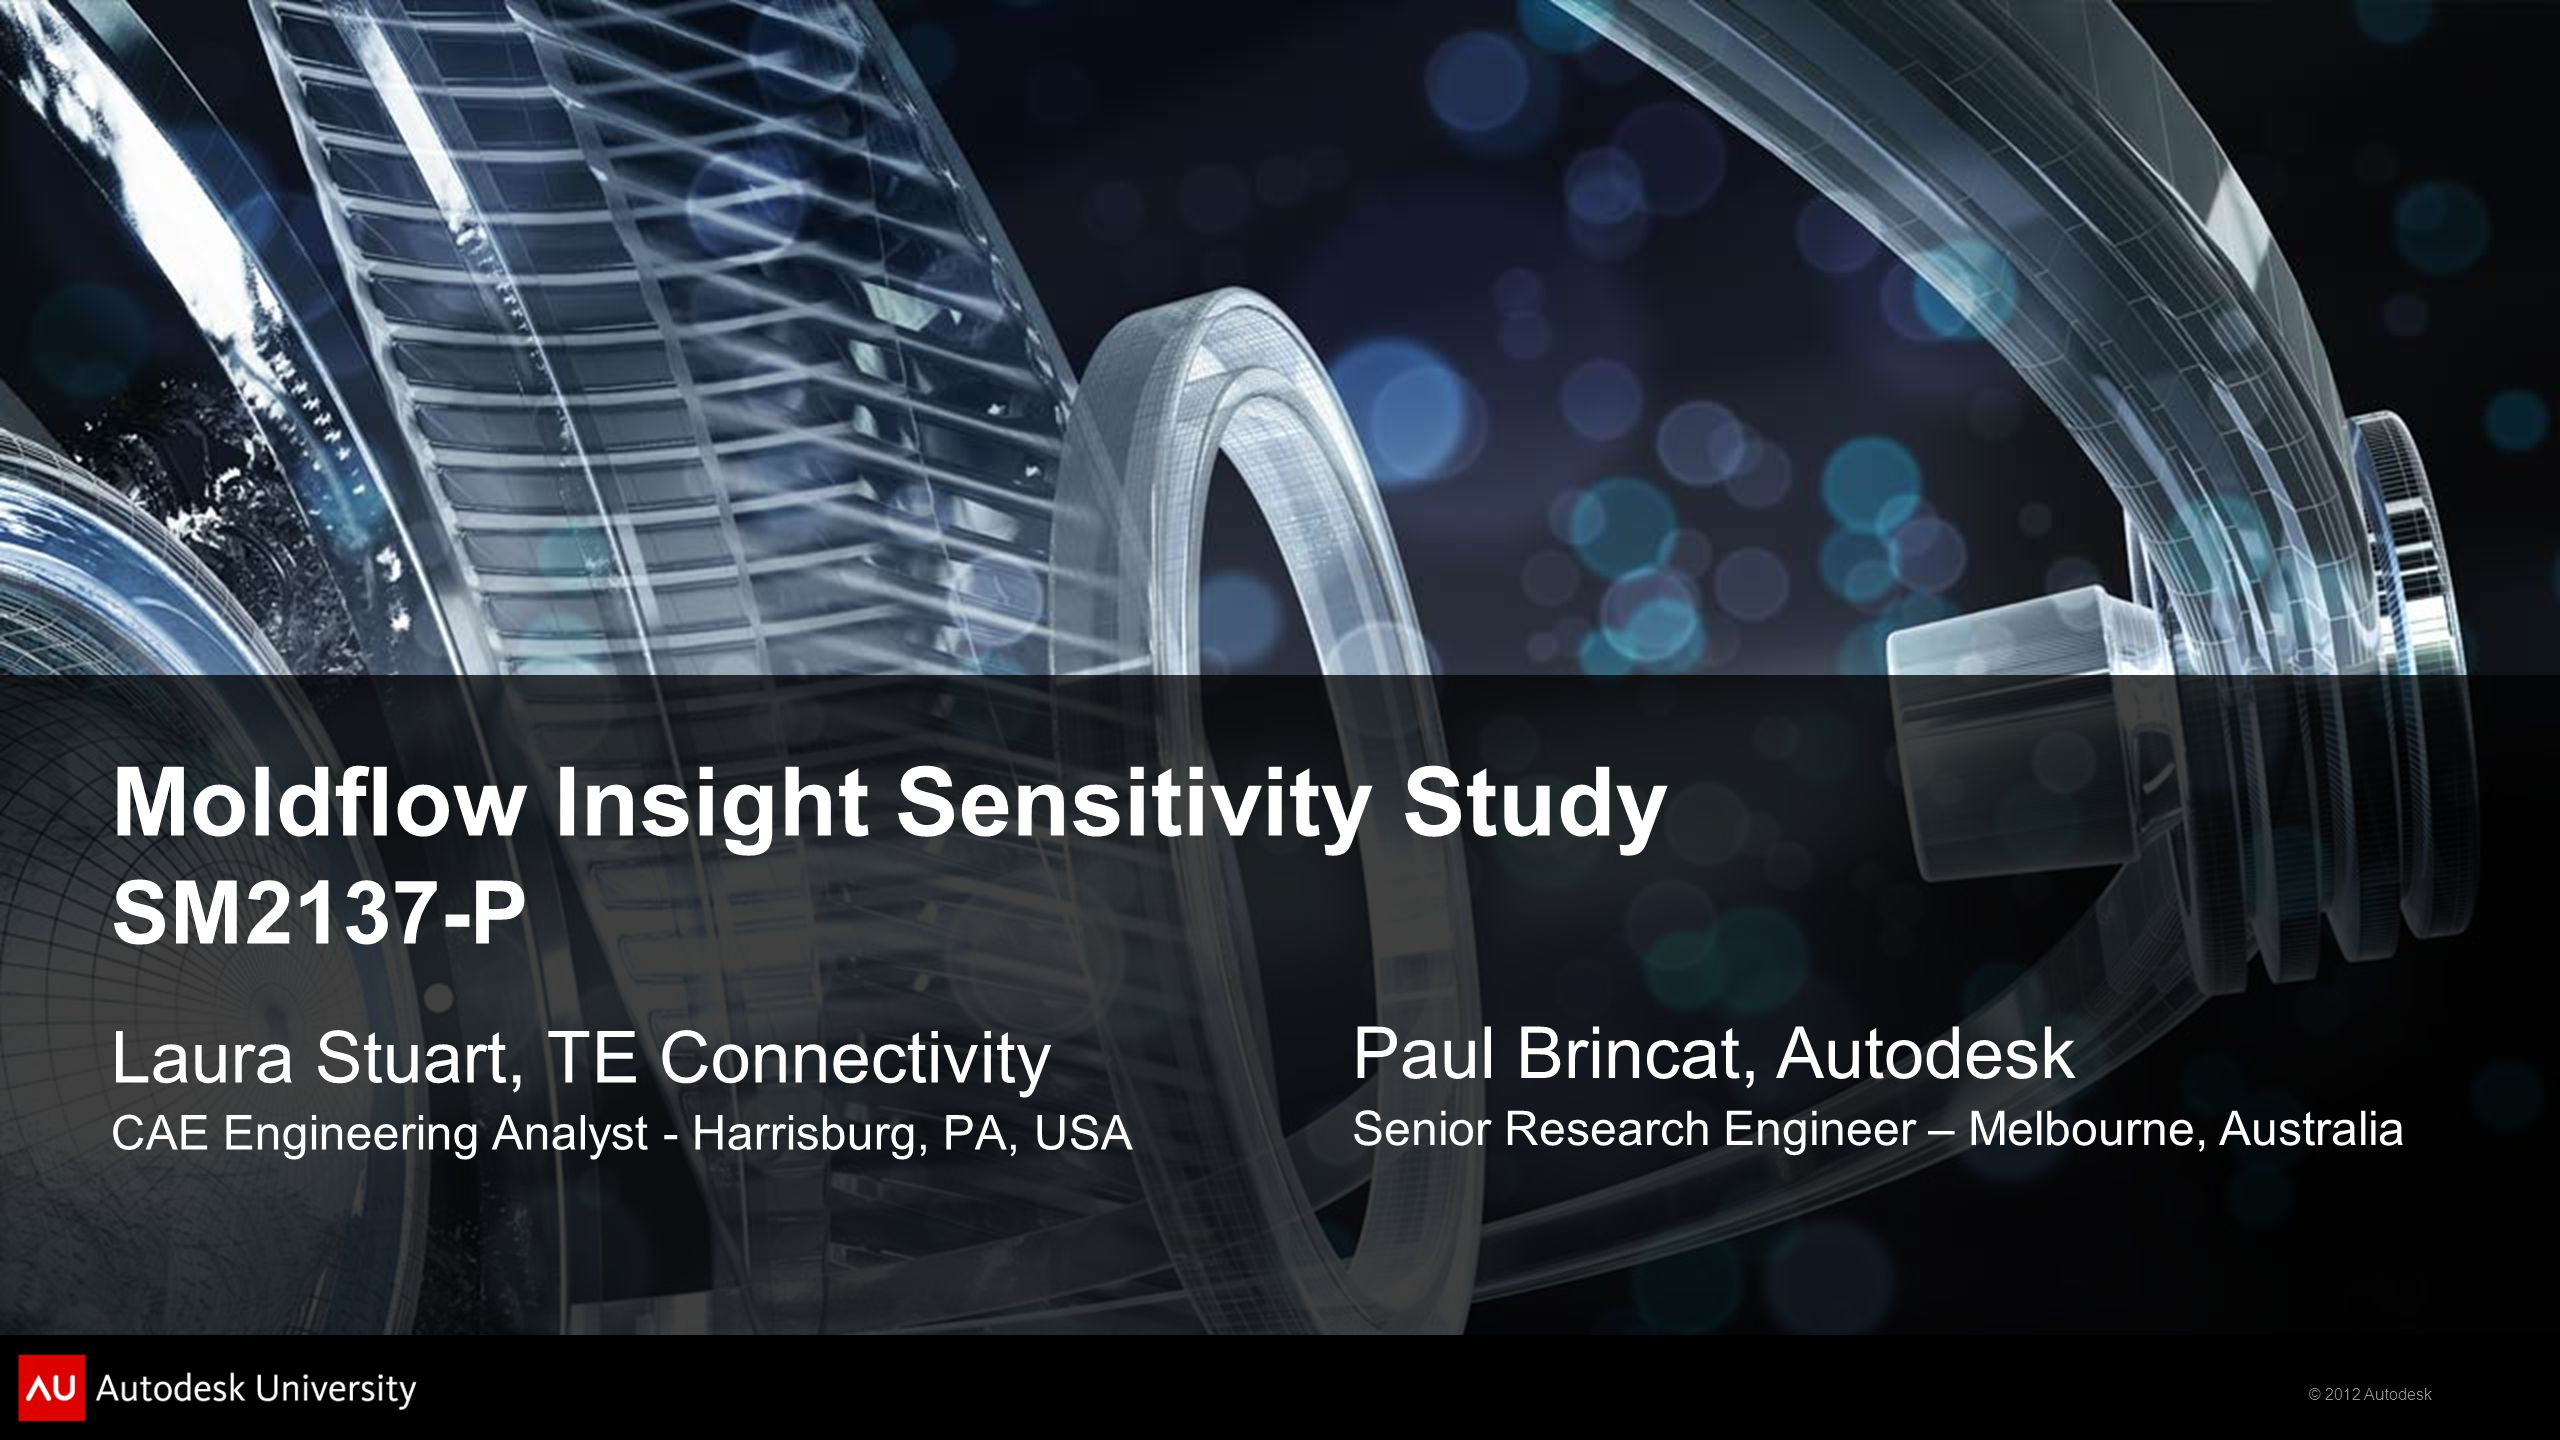 Moldflow Insight Sensitivity Study SM2137-P